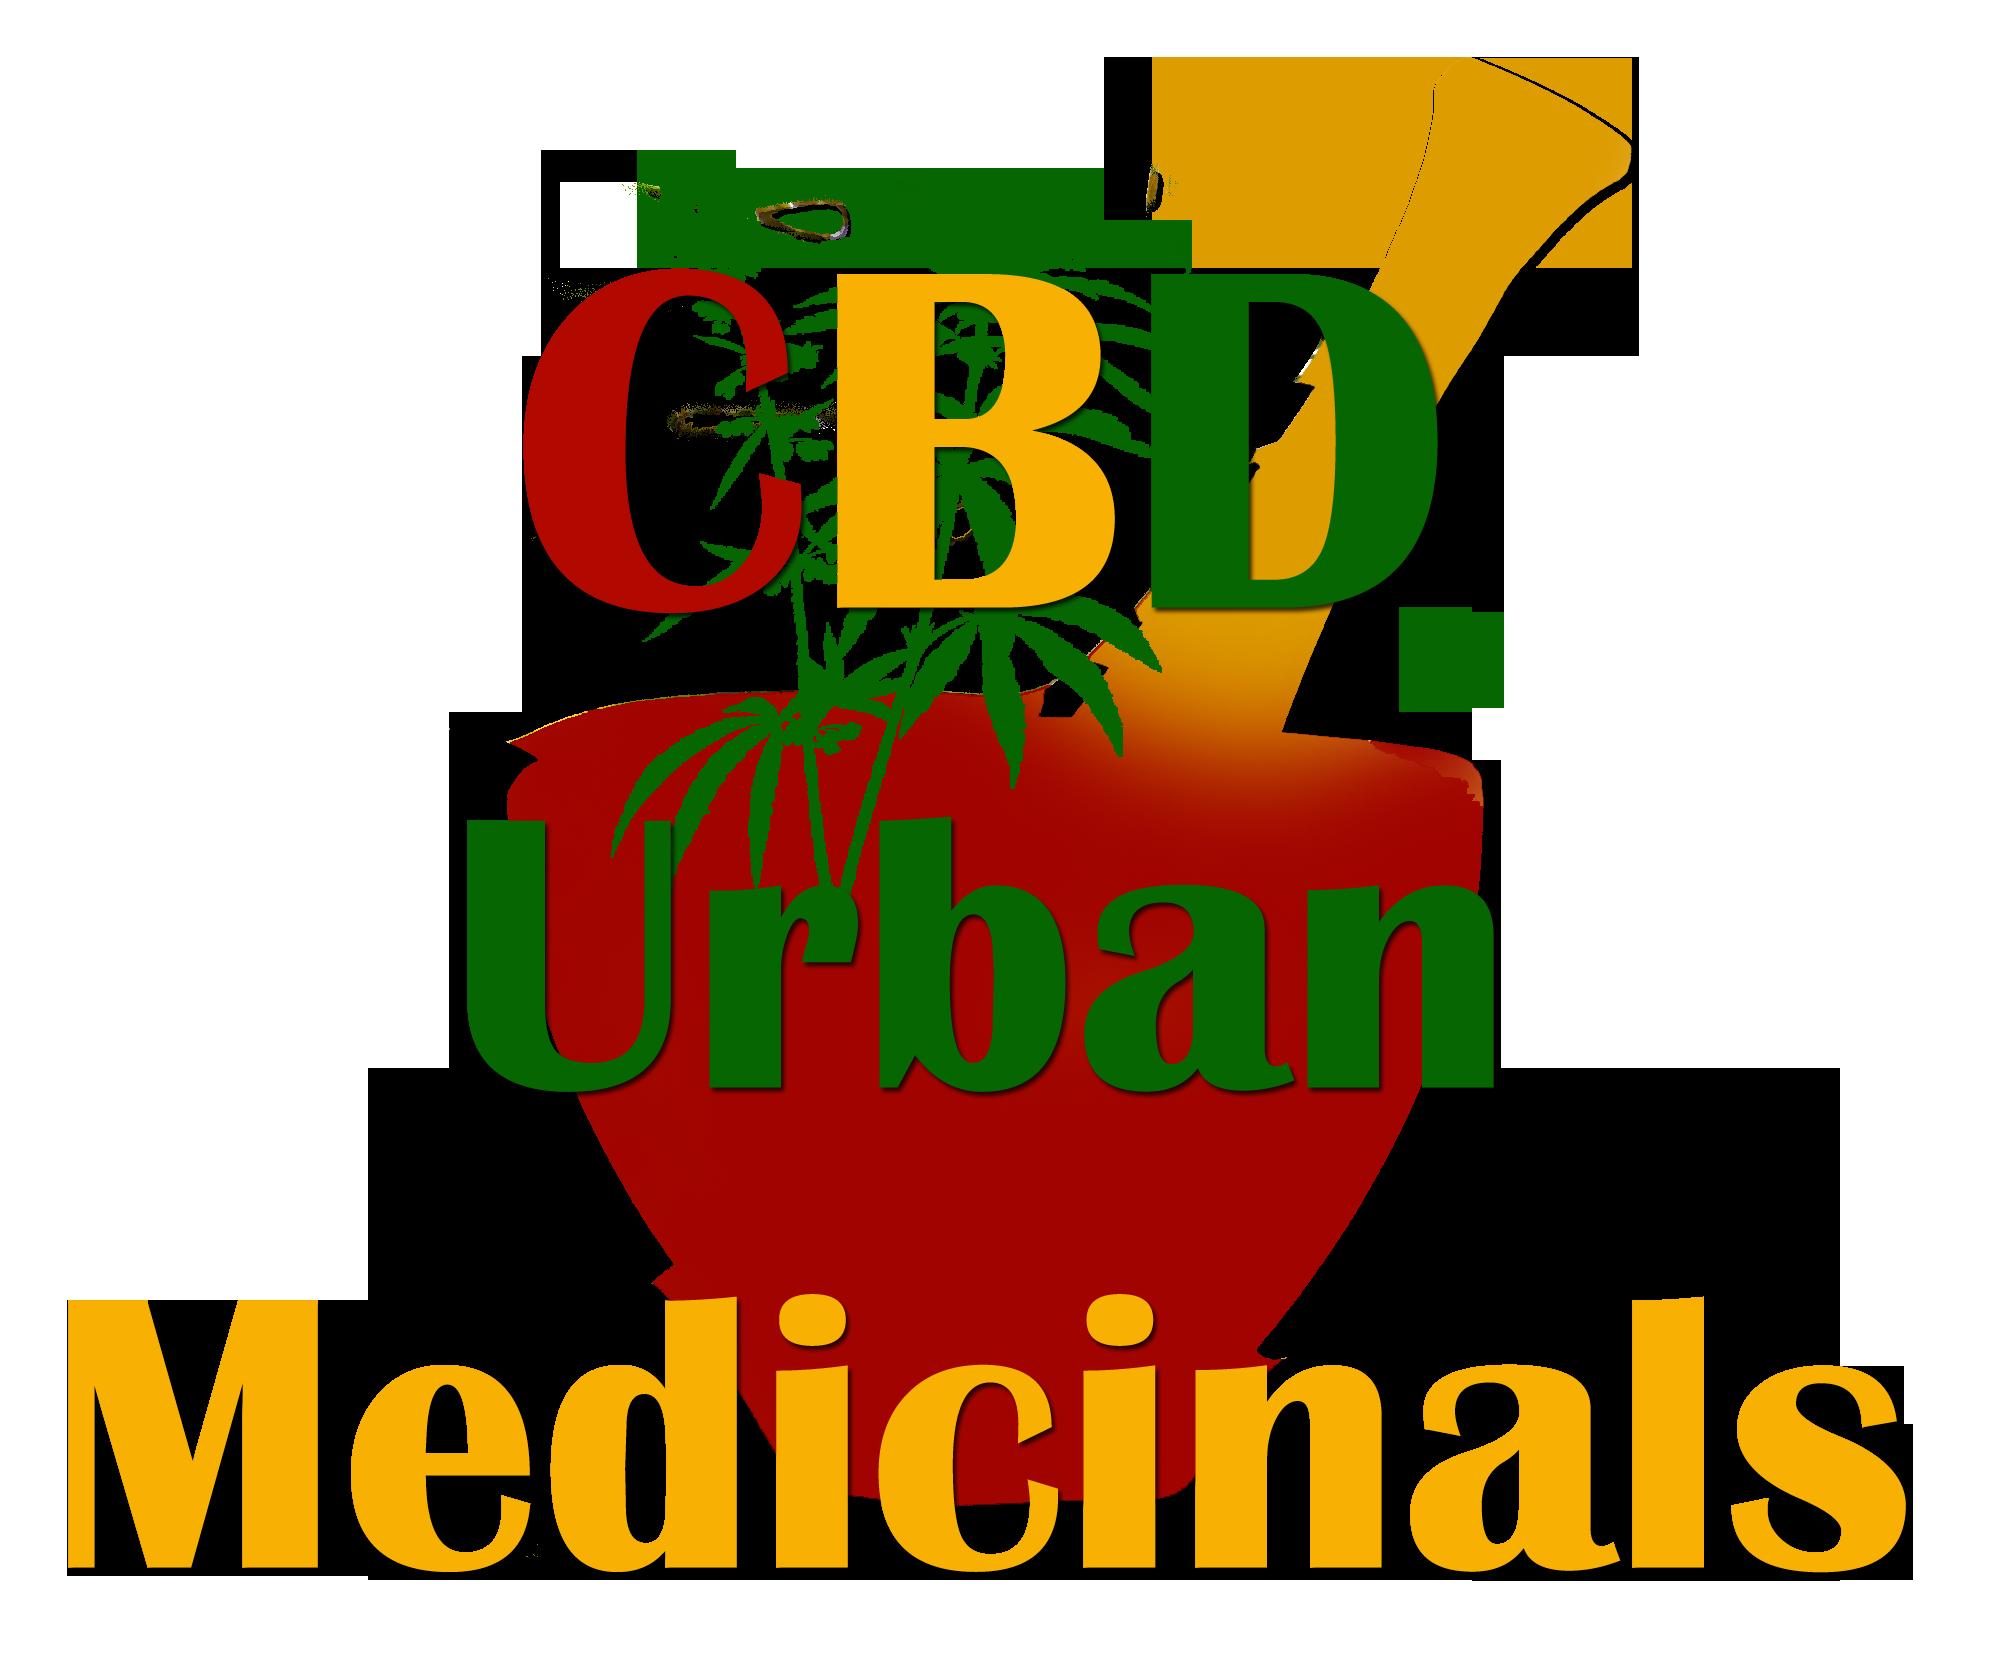 Logo for CBD Urban Medicinals